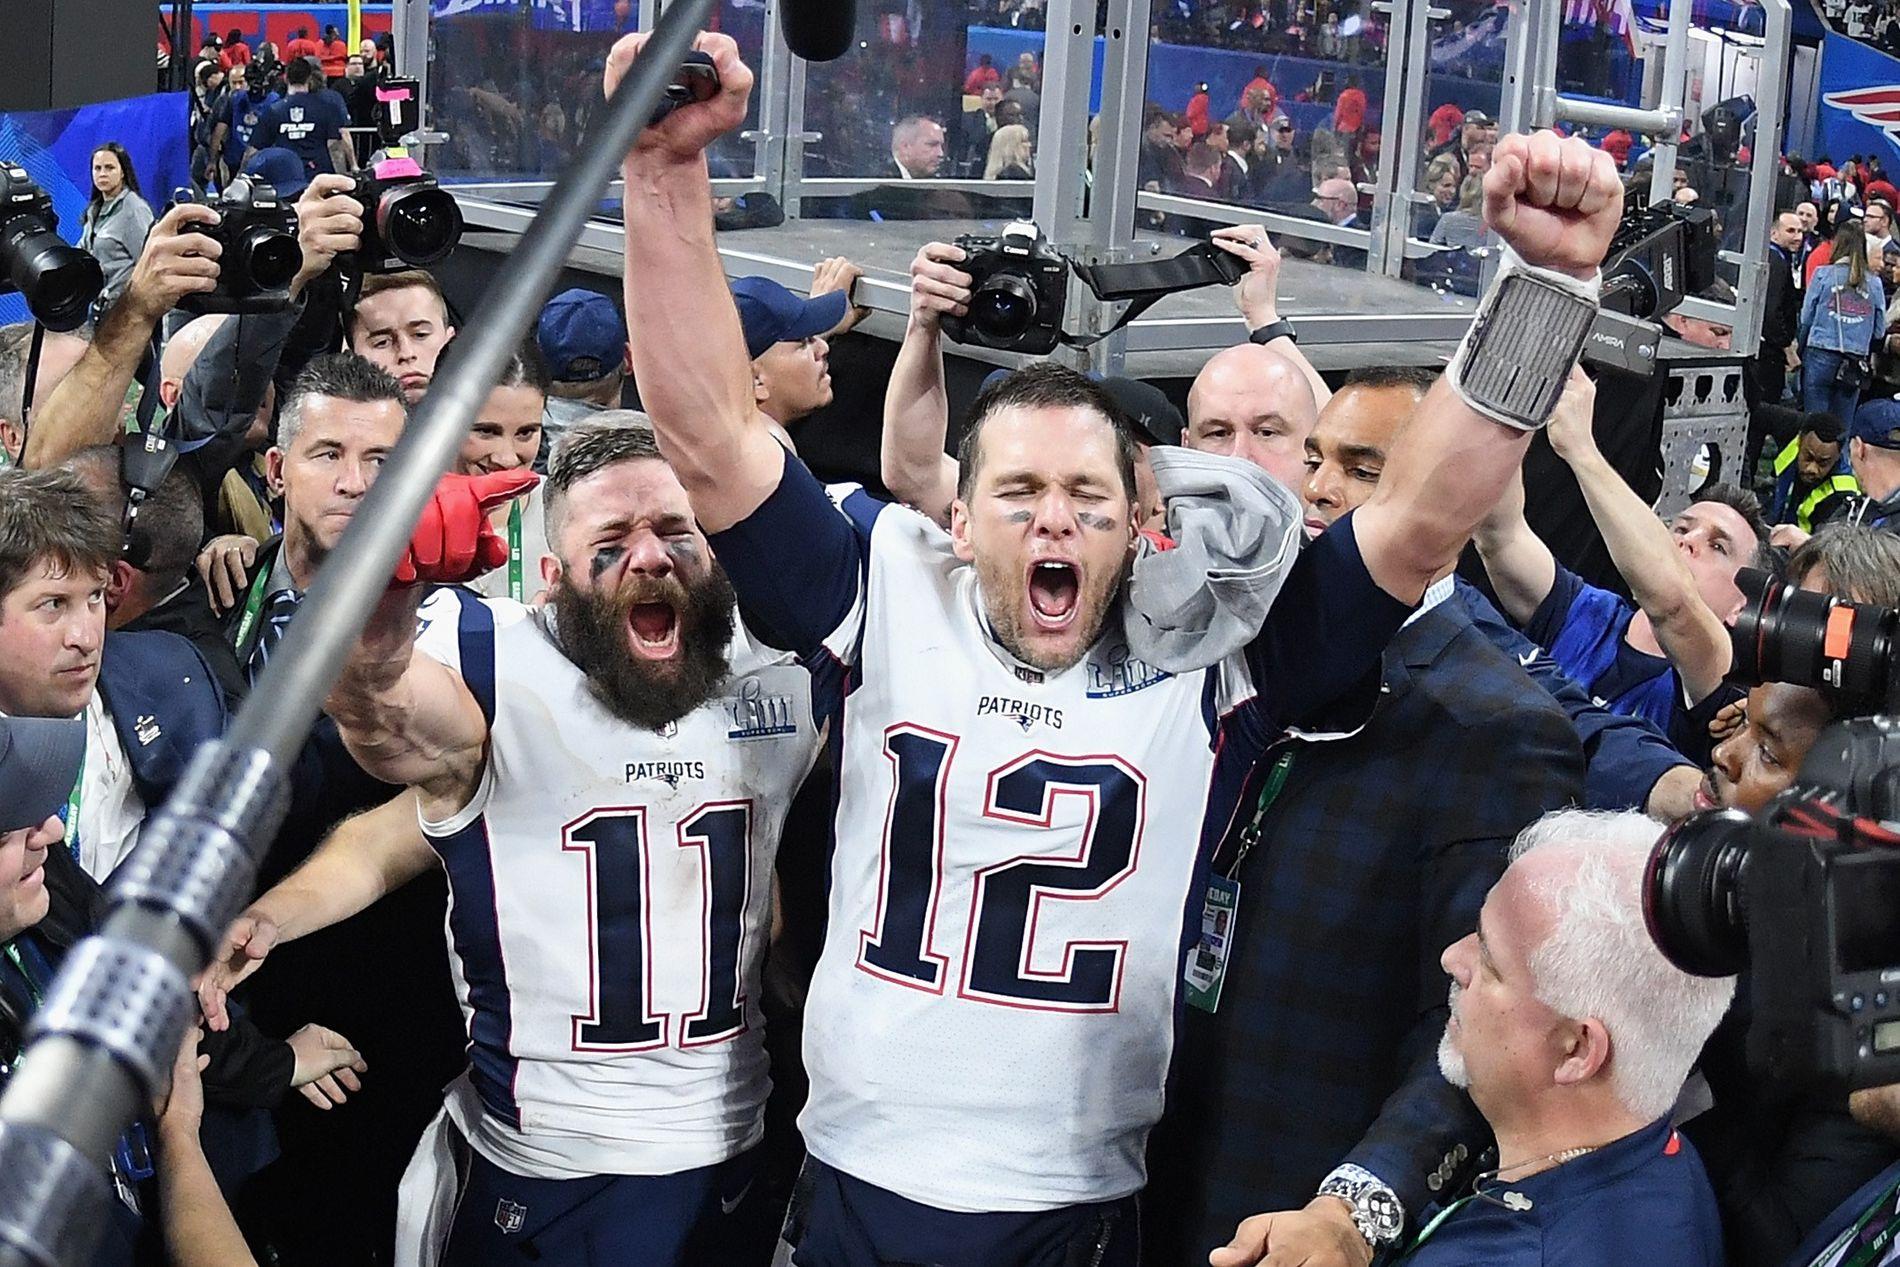 ARMENE I VÆRET: Tom Brady kunne juble sammen med wide receiver, MVP og «lillebror» Julian Edelman.